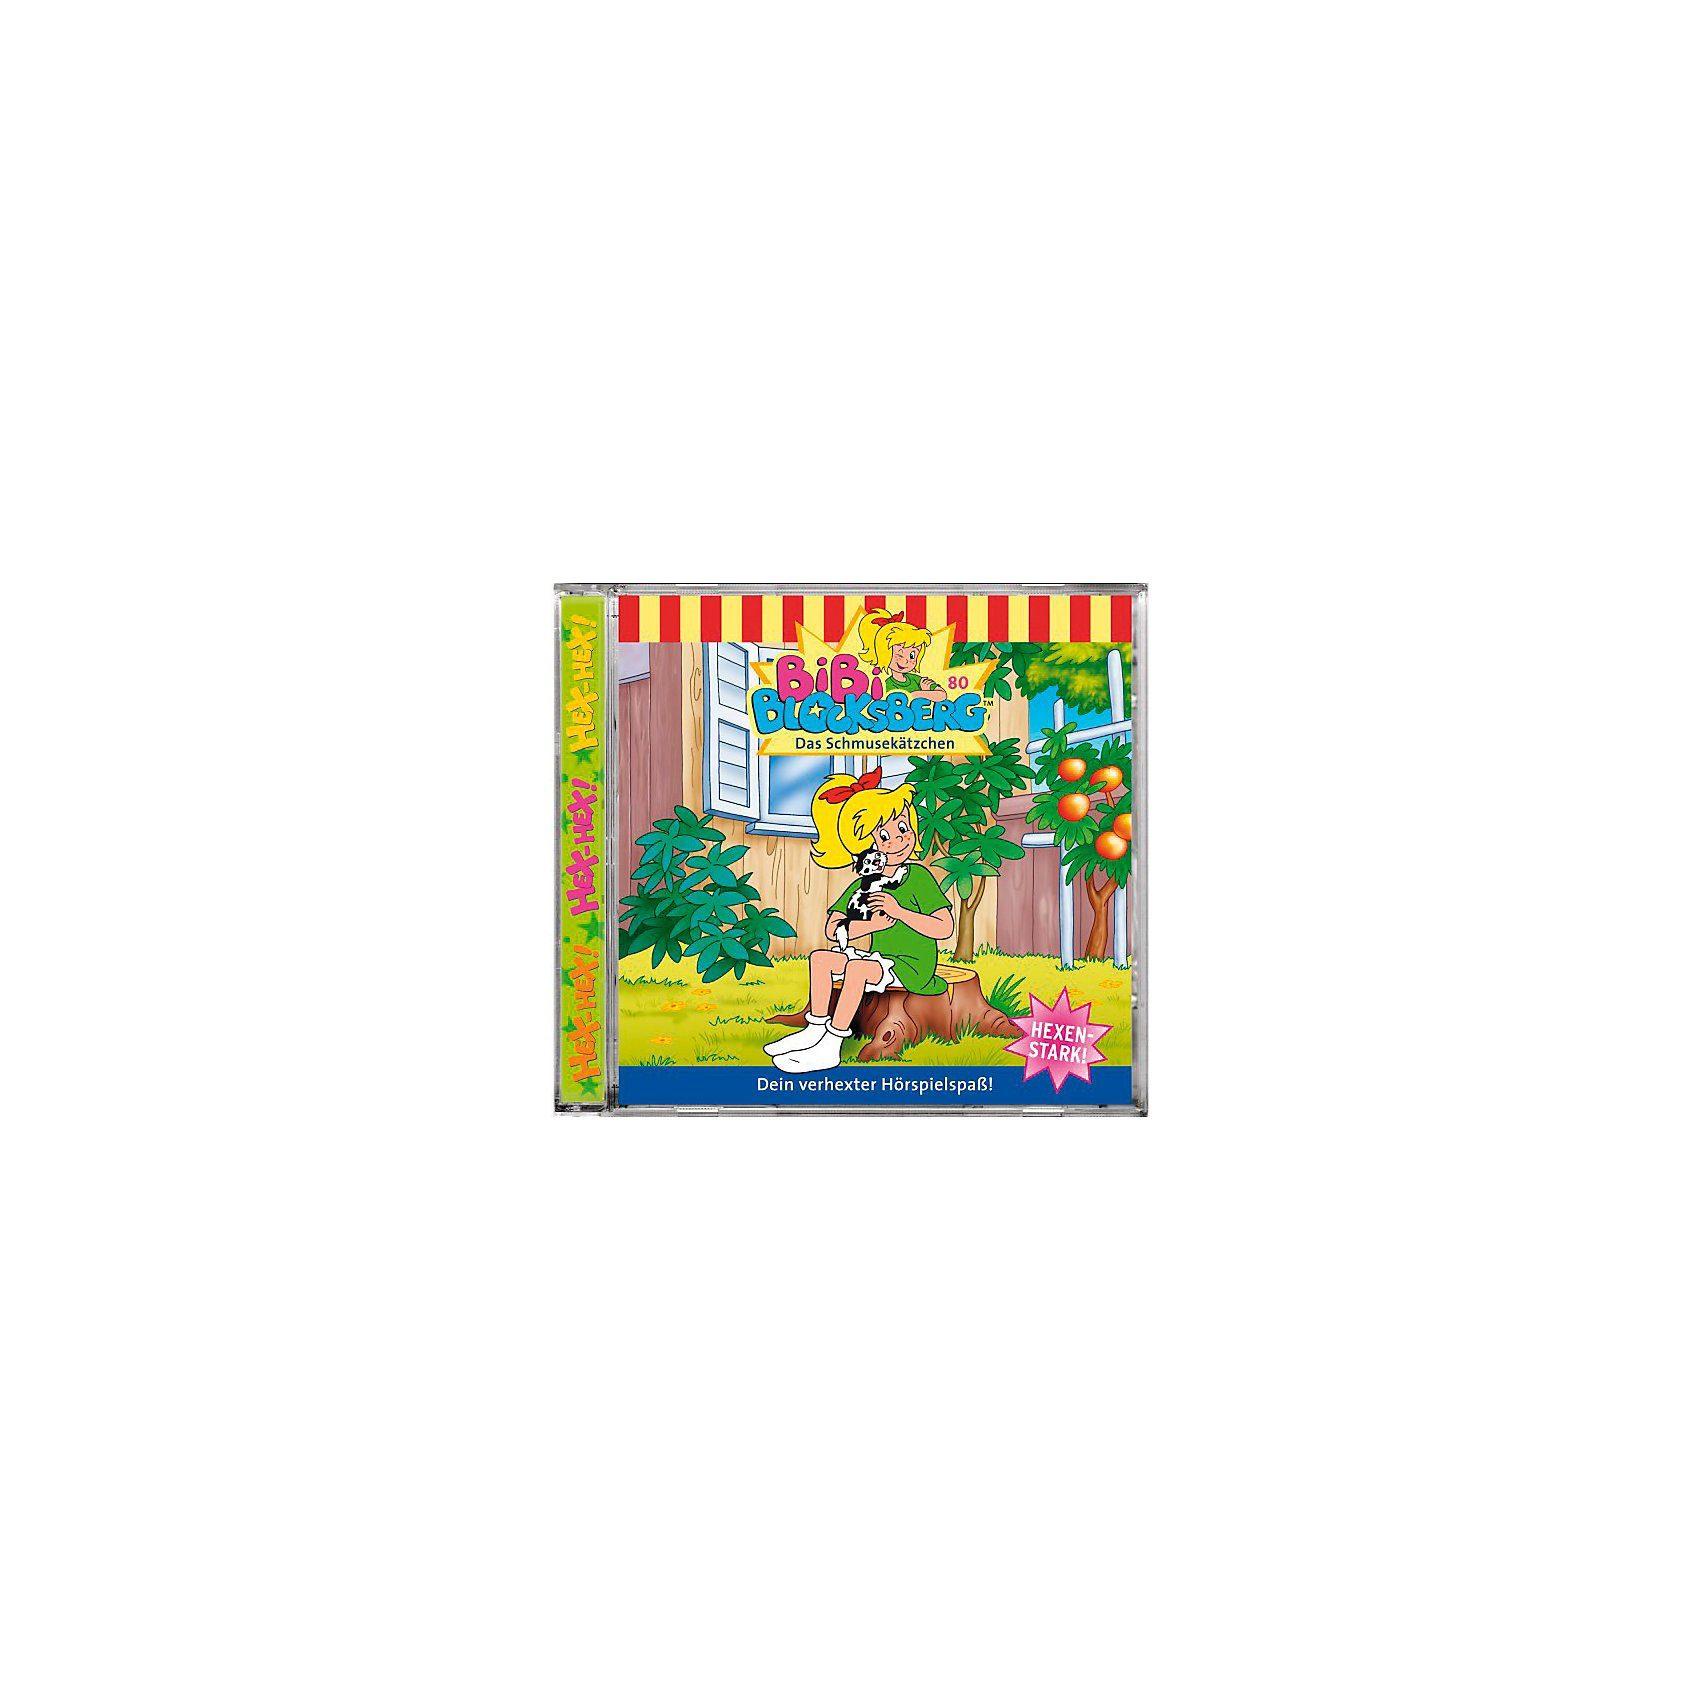 Kiddinx CD Bibi Blocksberg 80 (Schmusekätzchen)